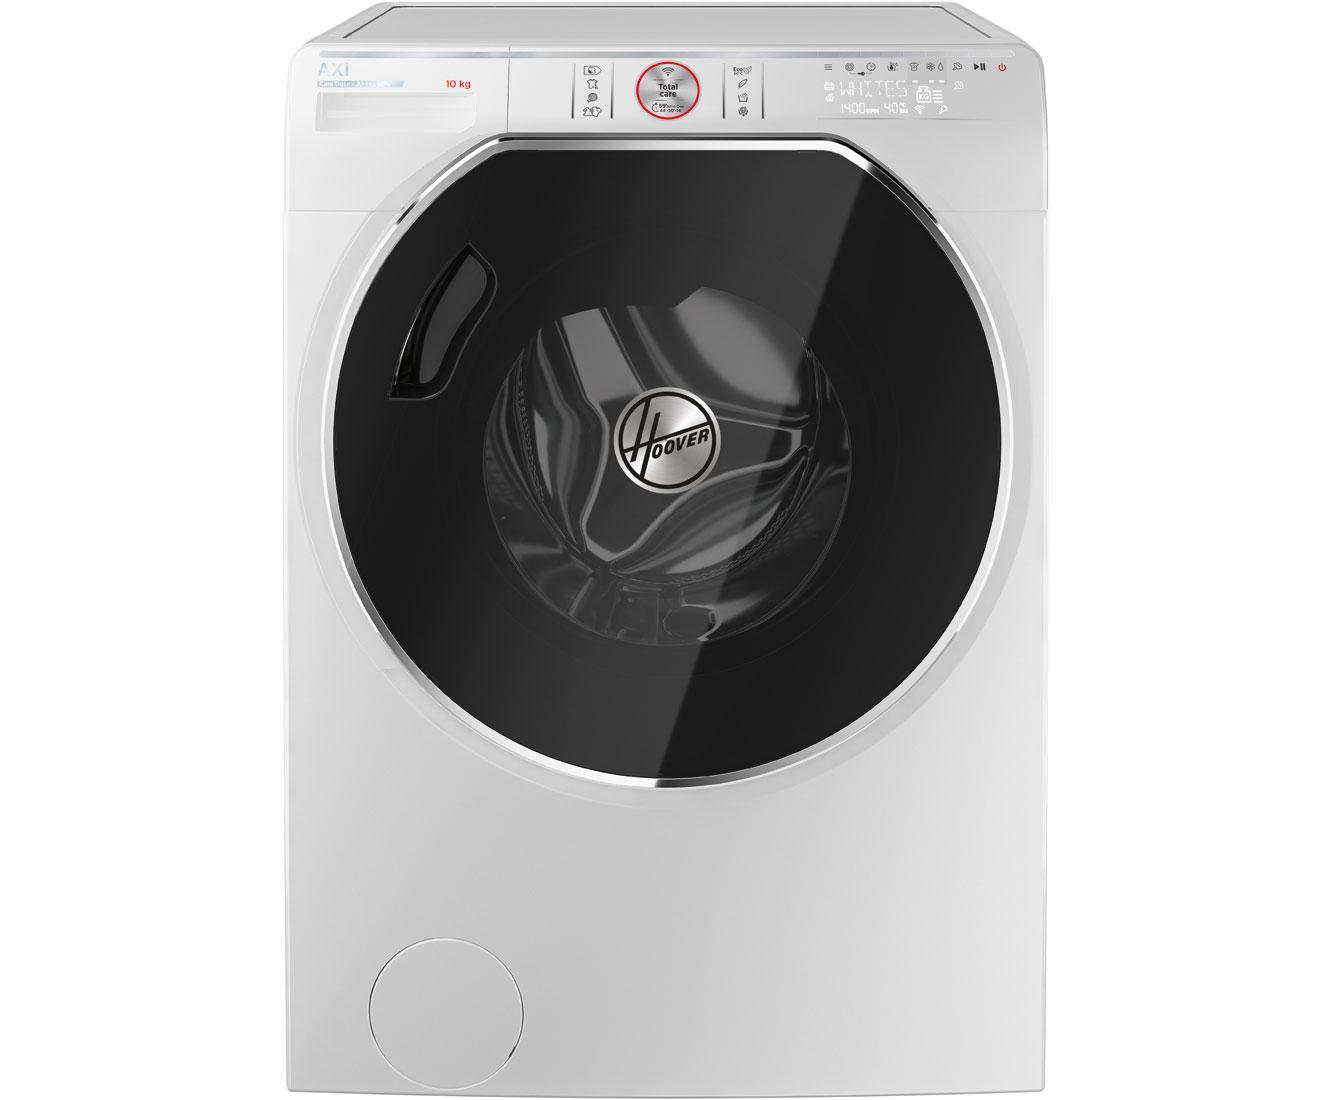 Hoover awmpd 410lh8 1 s waschmaschine 10 kg 1400 u min a